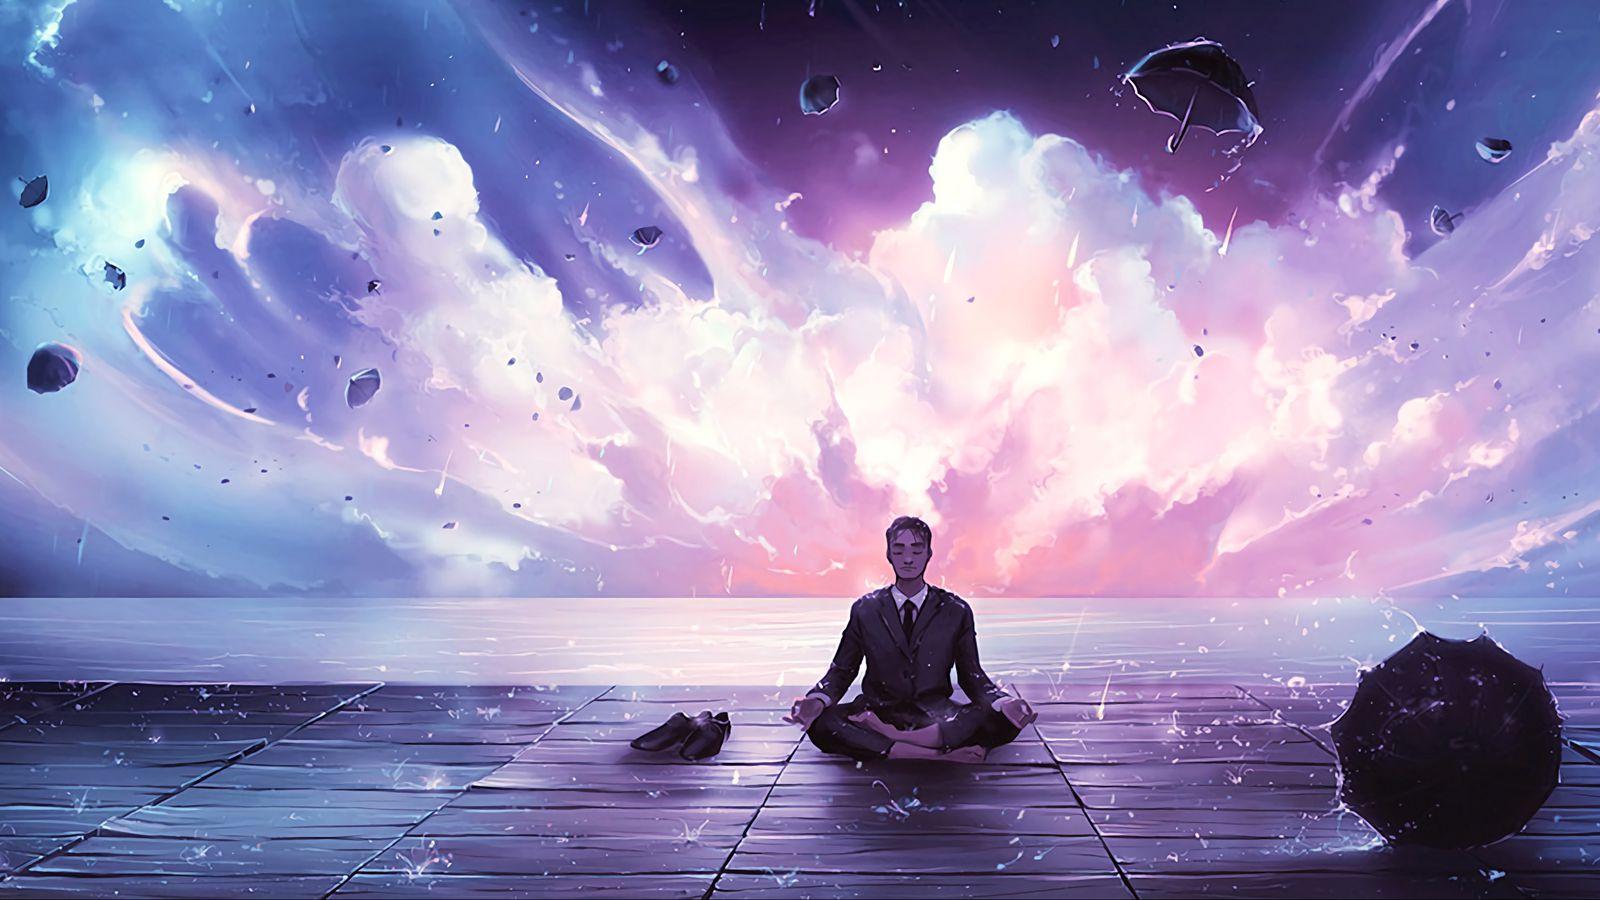 1600x900 Wallpaper meditation, calmness, harmony, art, man, rain, eureka